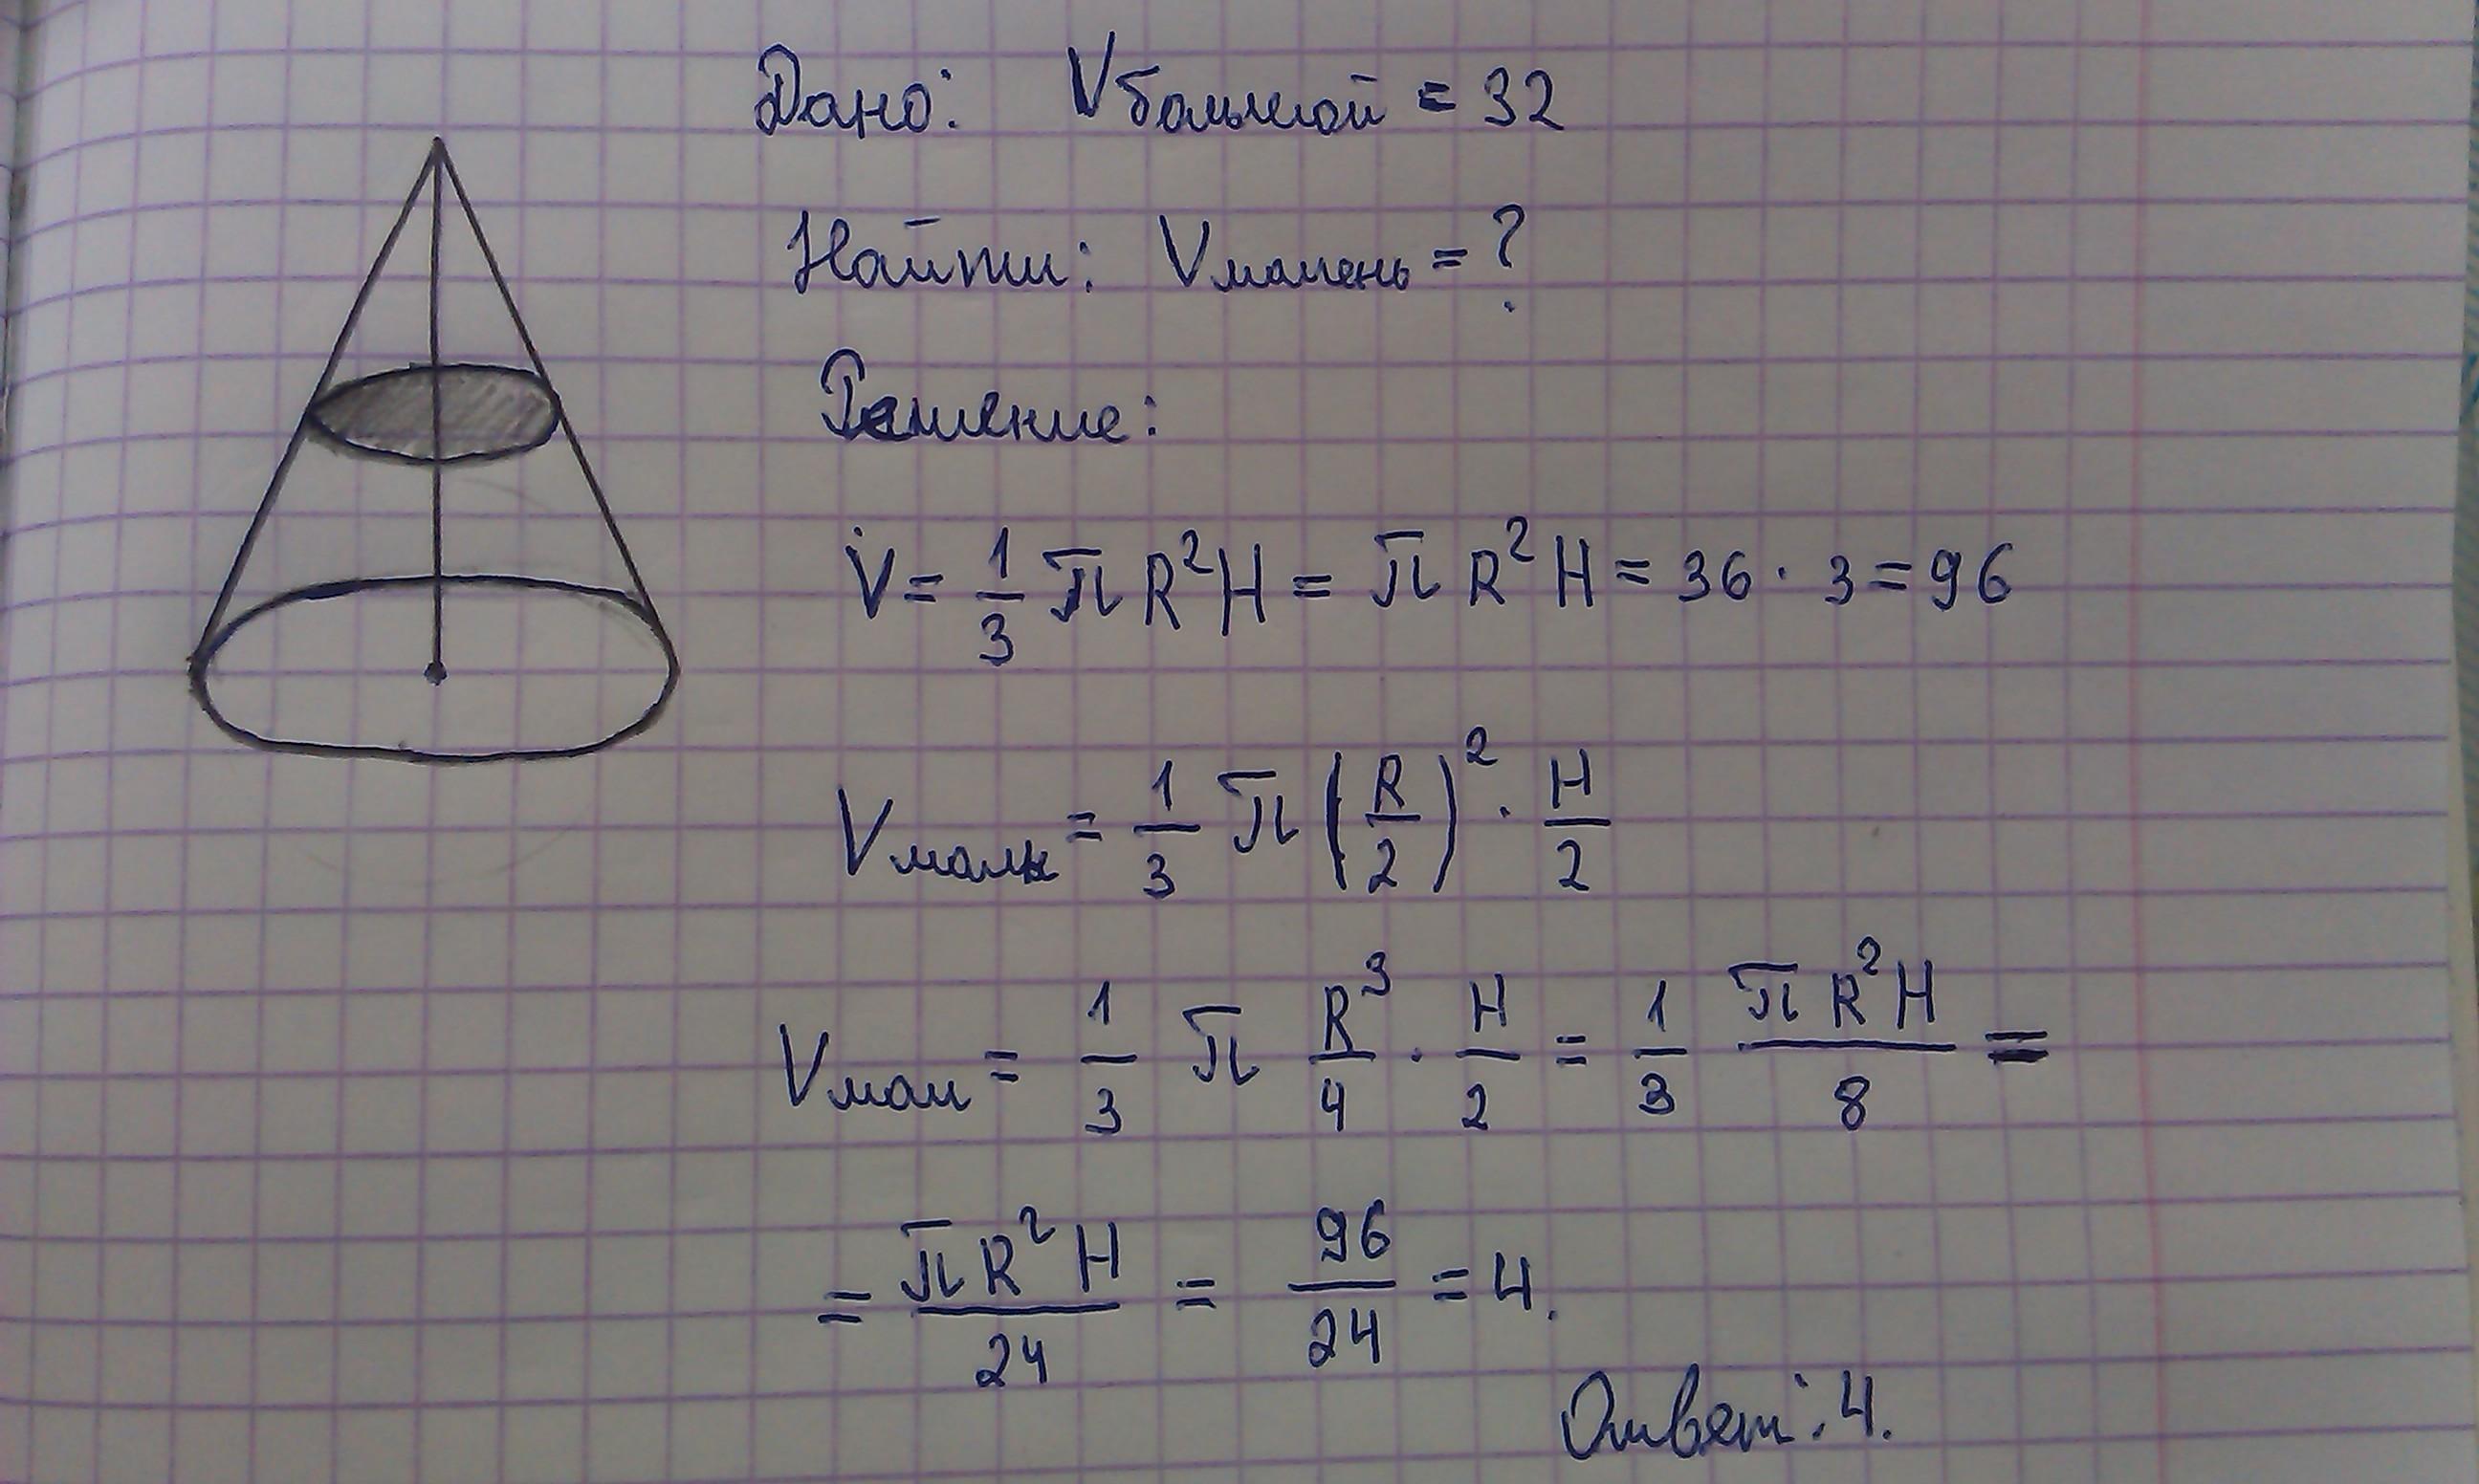 Объем конуса решение задач решение задачи биссектрисы углов в